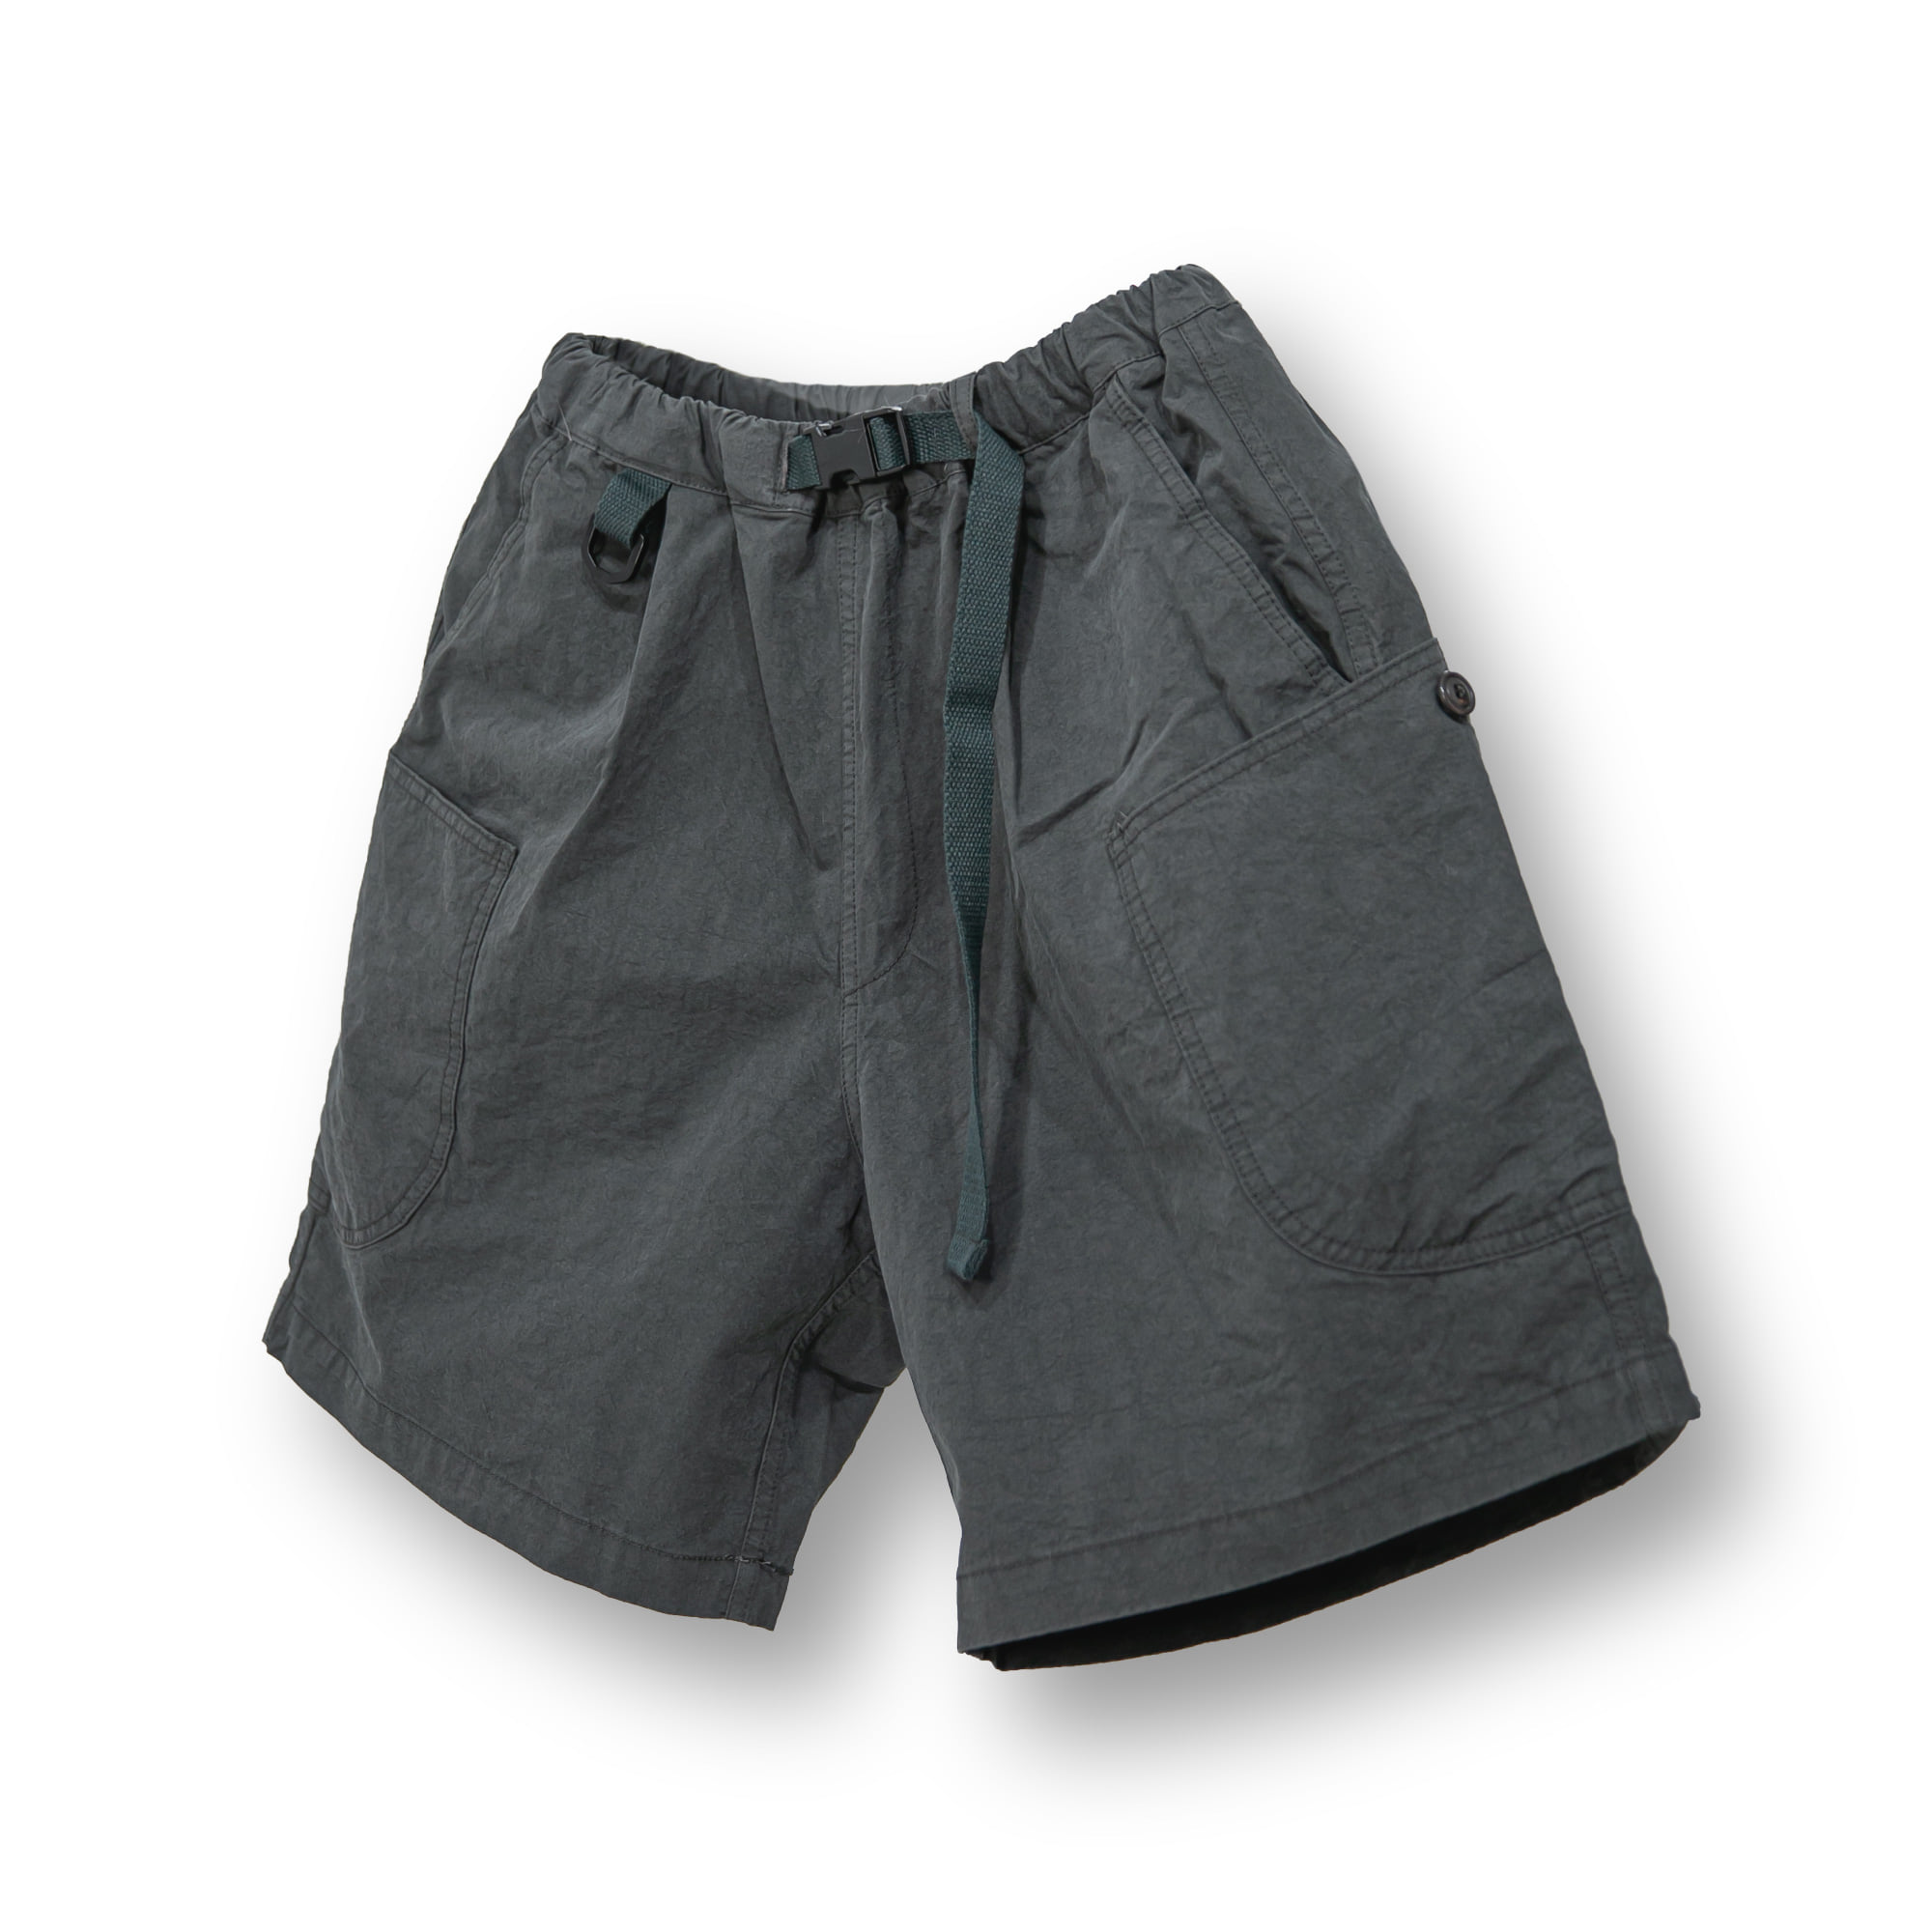 Oblique Cargo Shorts - Charcoal